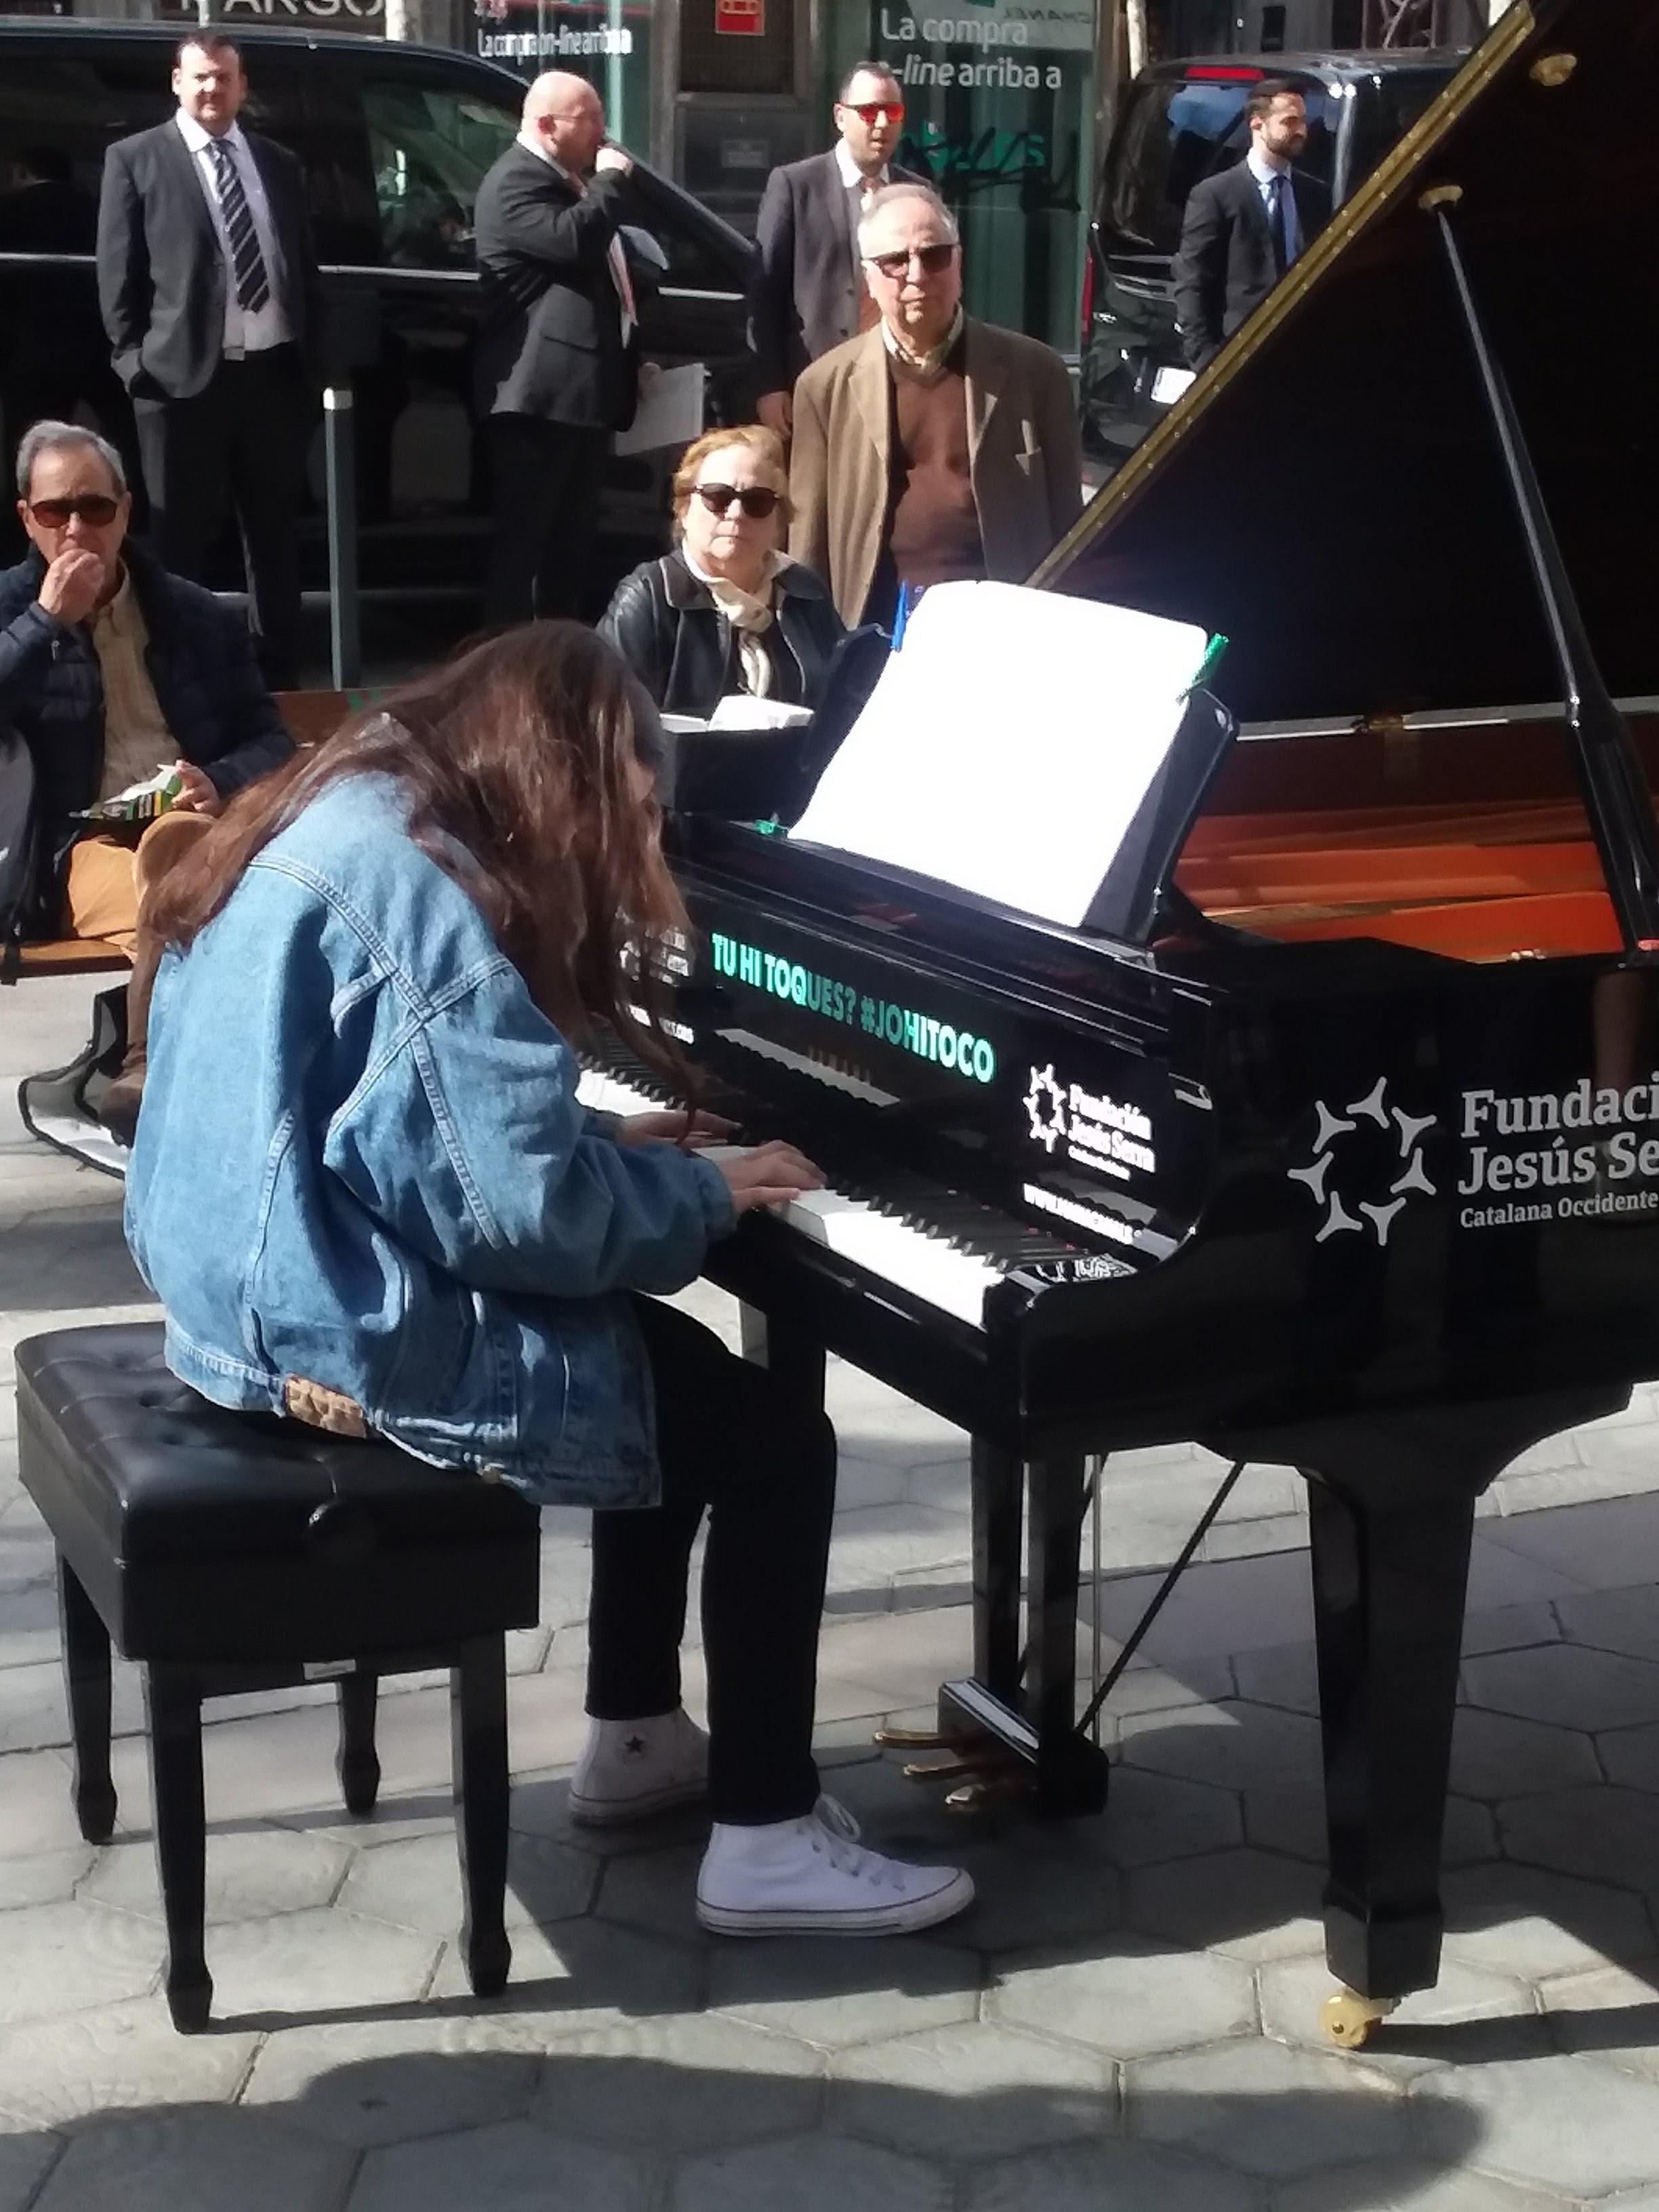 Piano man outside Hotel Majestic